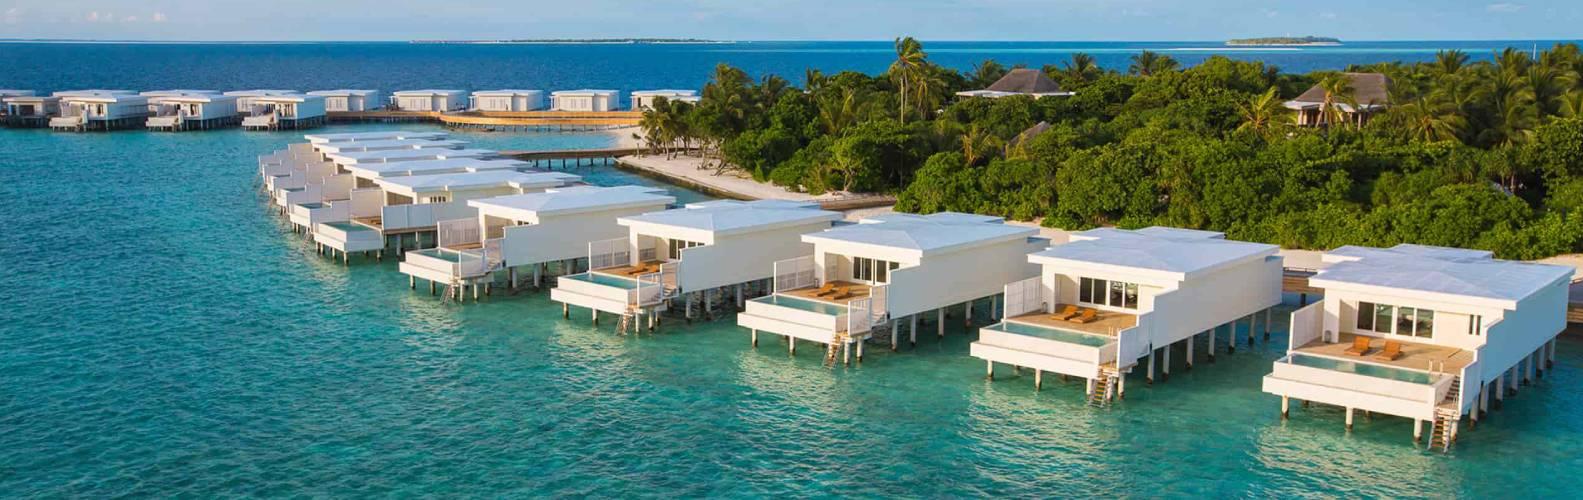 Amilla Fushi Maldives - Pool Villas